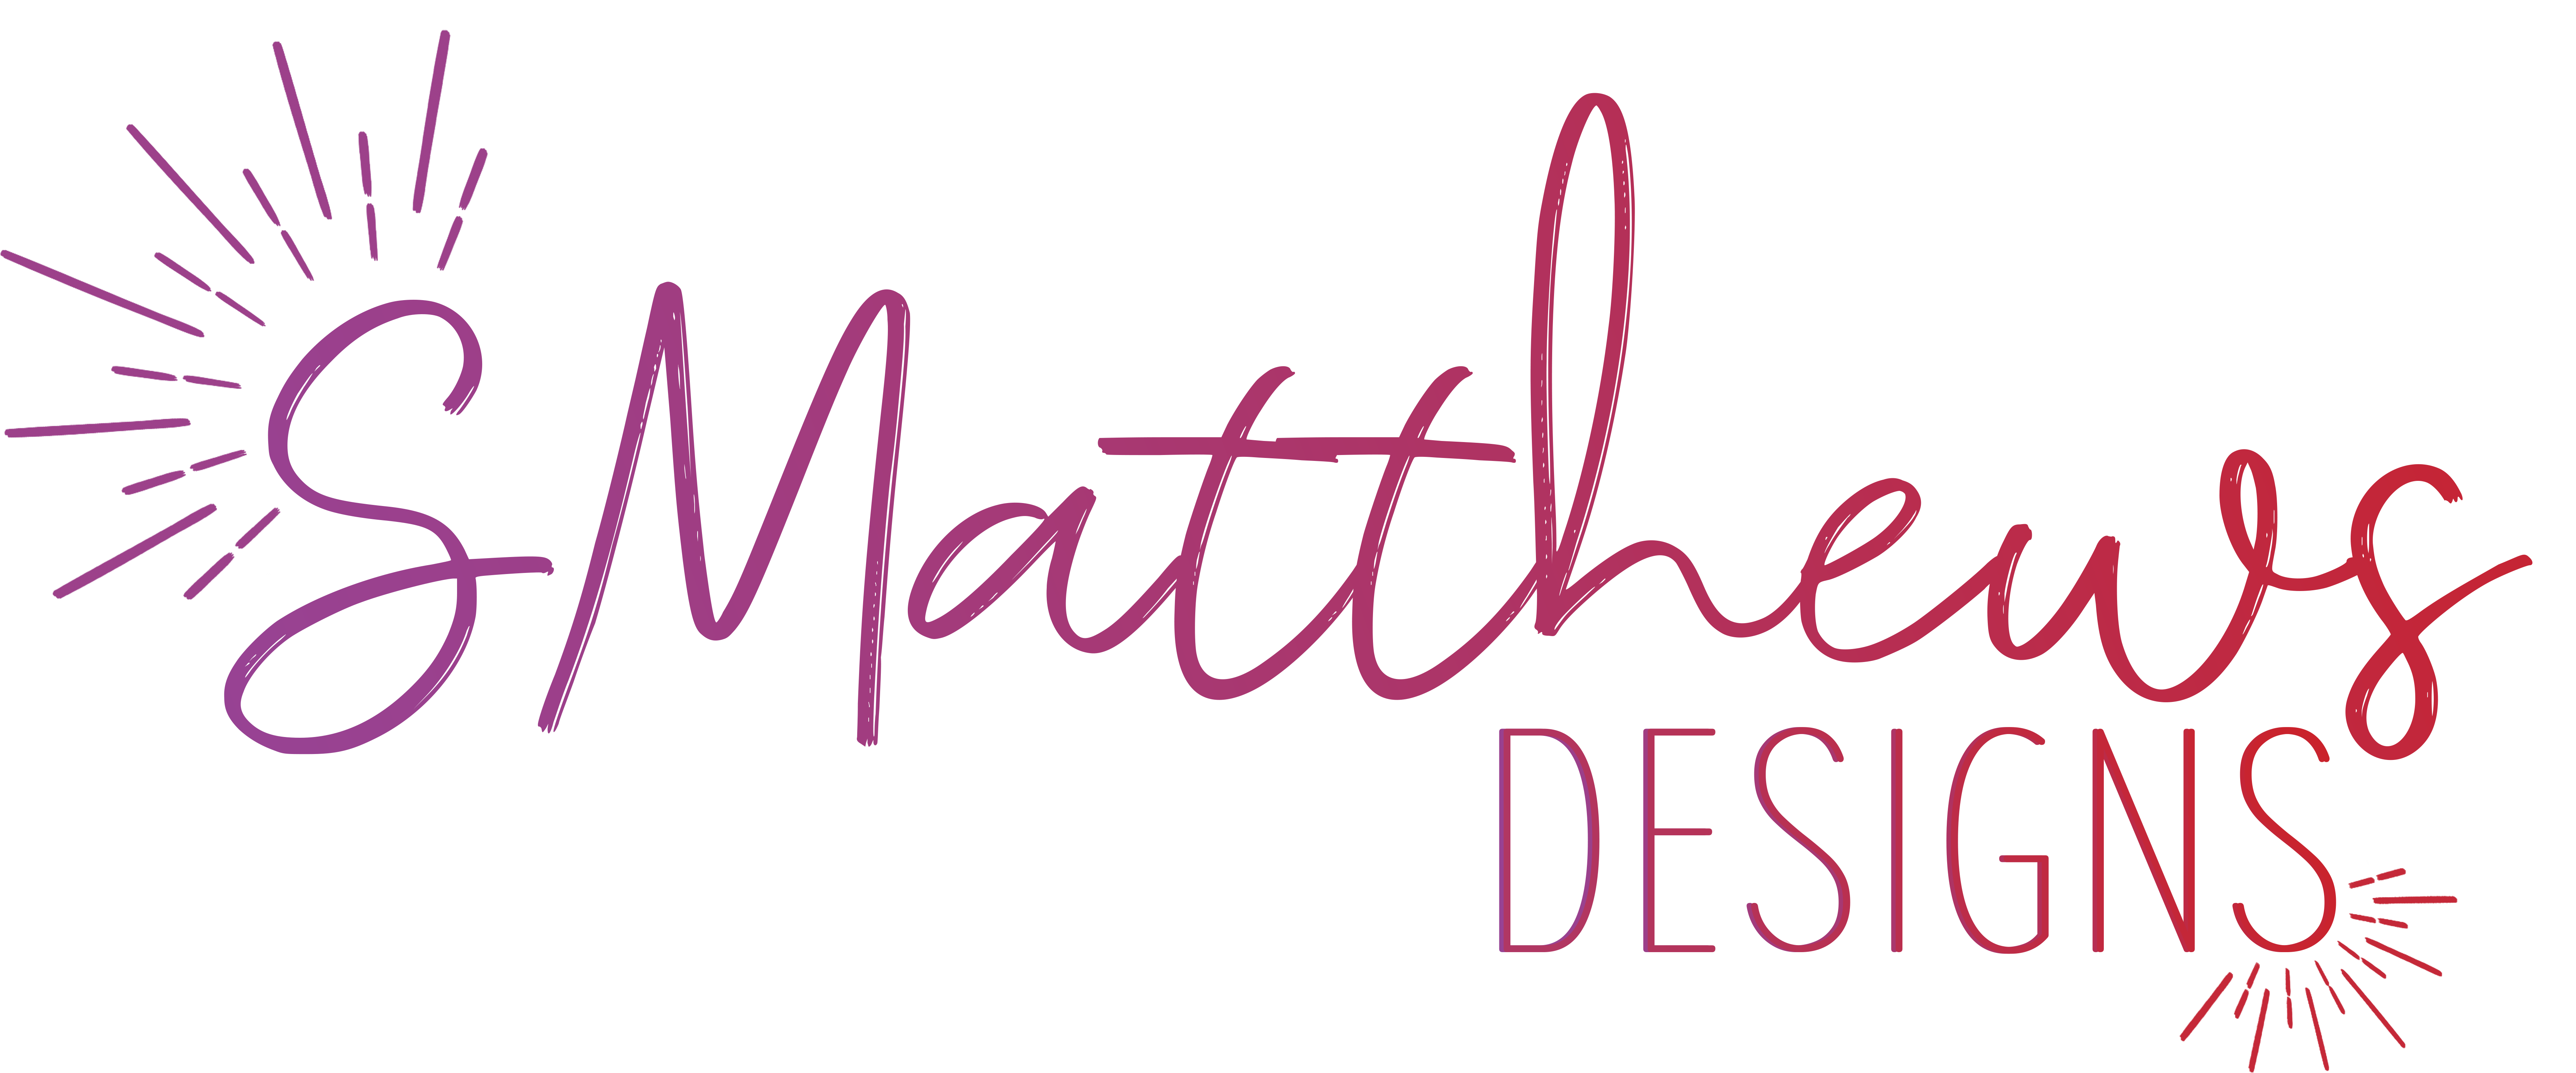 SMatthews Designs : Branding, Web Design and SEO in Fuquay Varina, NC